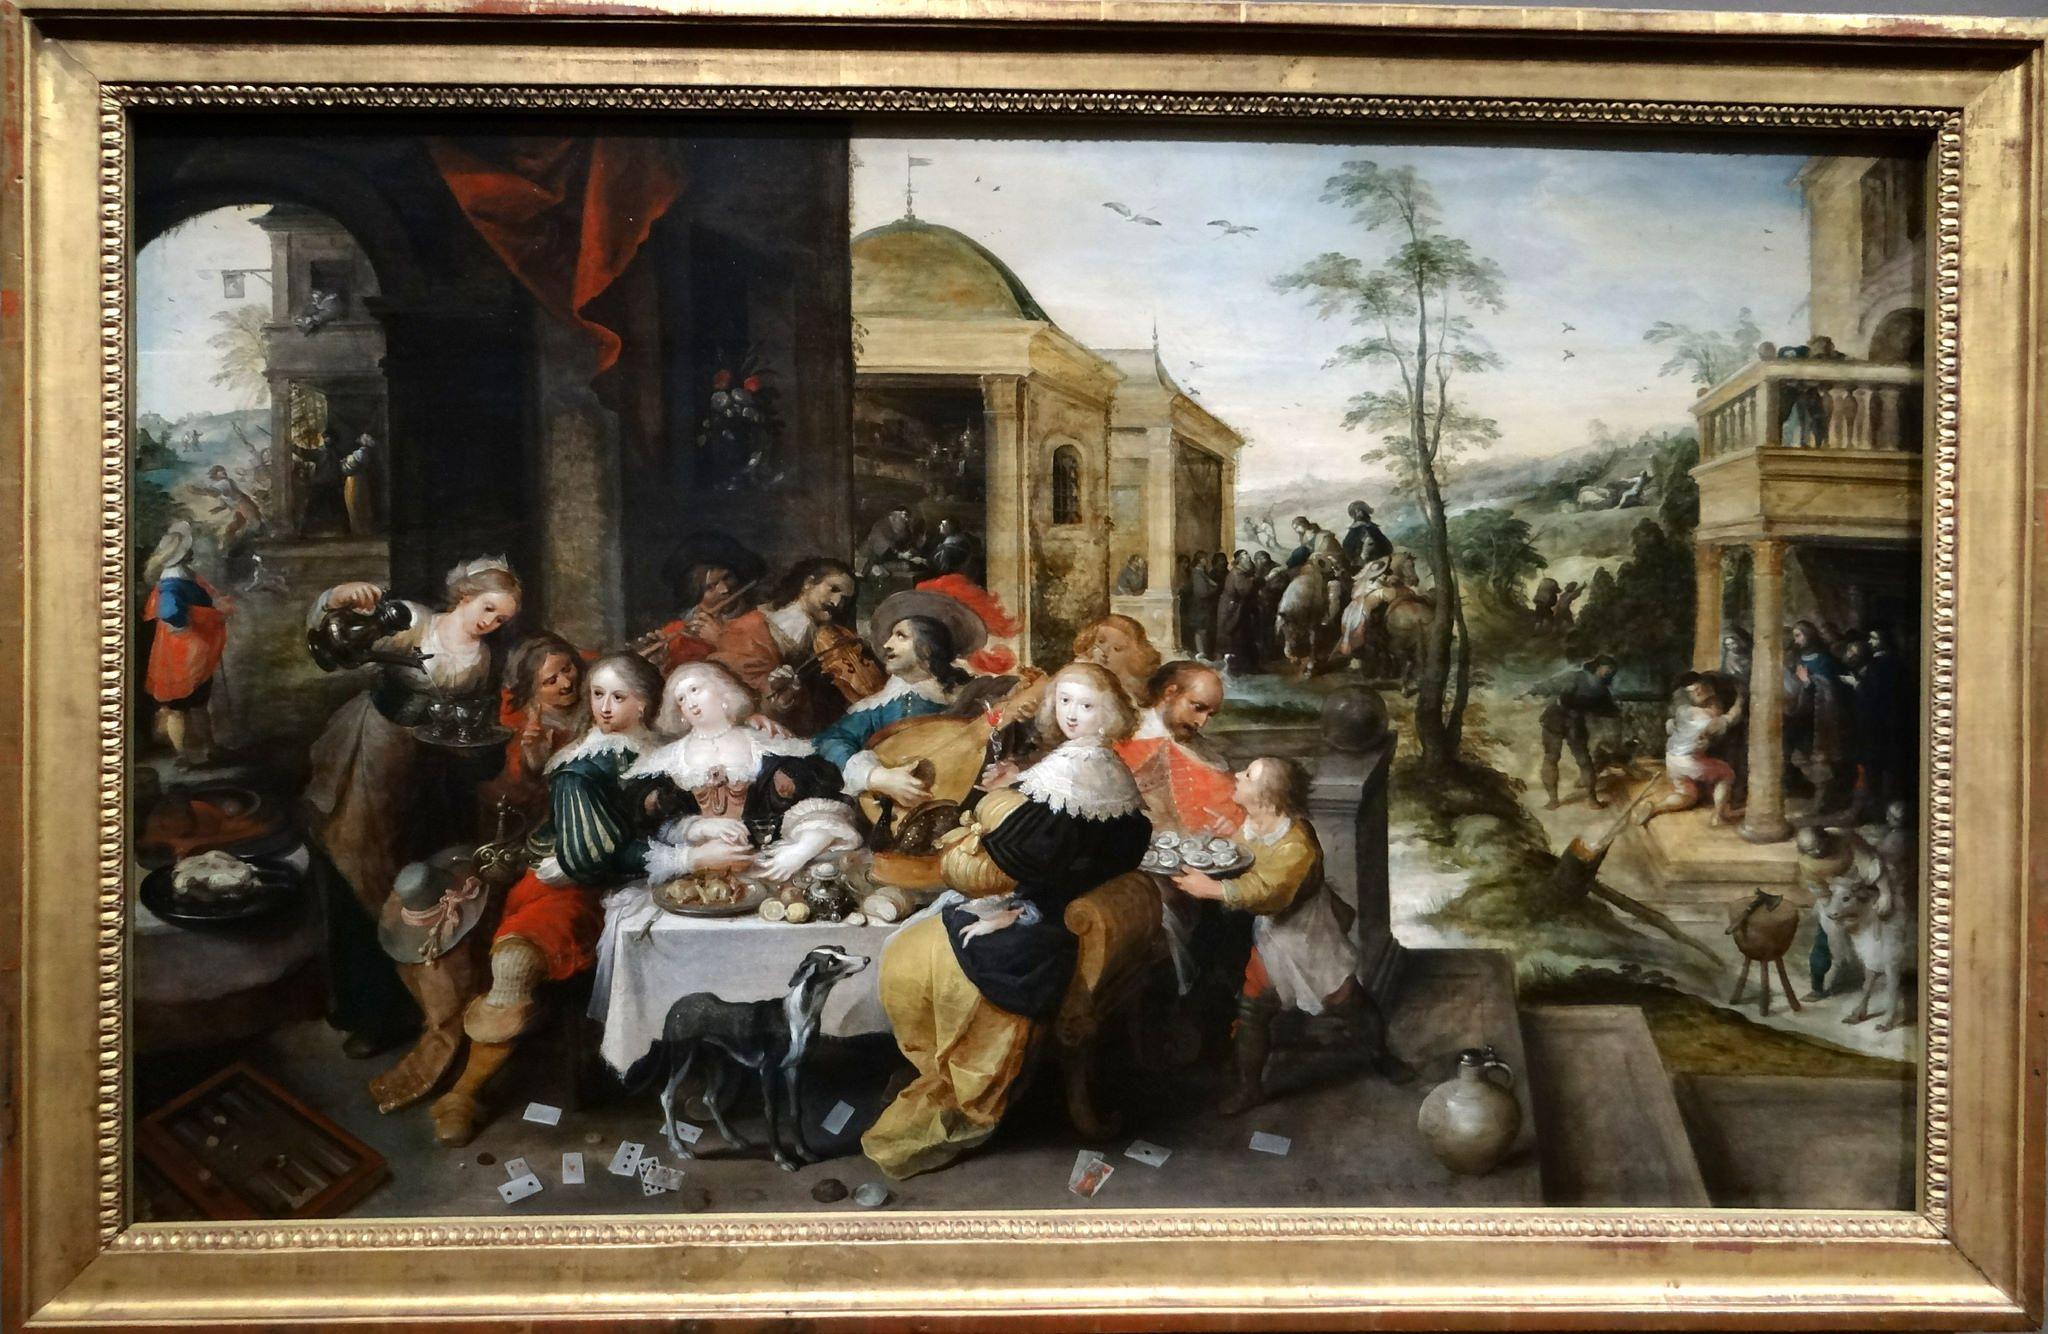 Staatliche Kunsthalle Karlsruhe Painting Karlsruhe Prodigal Son